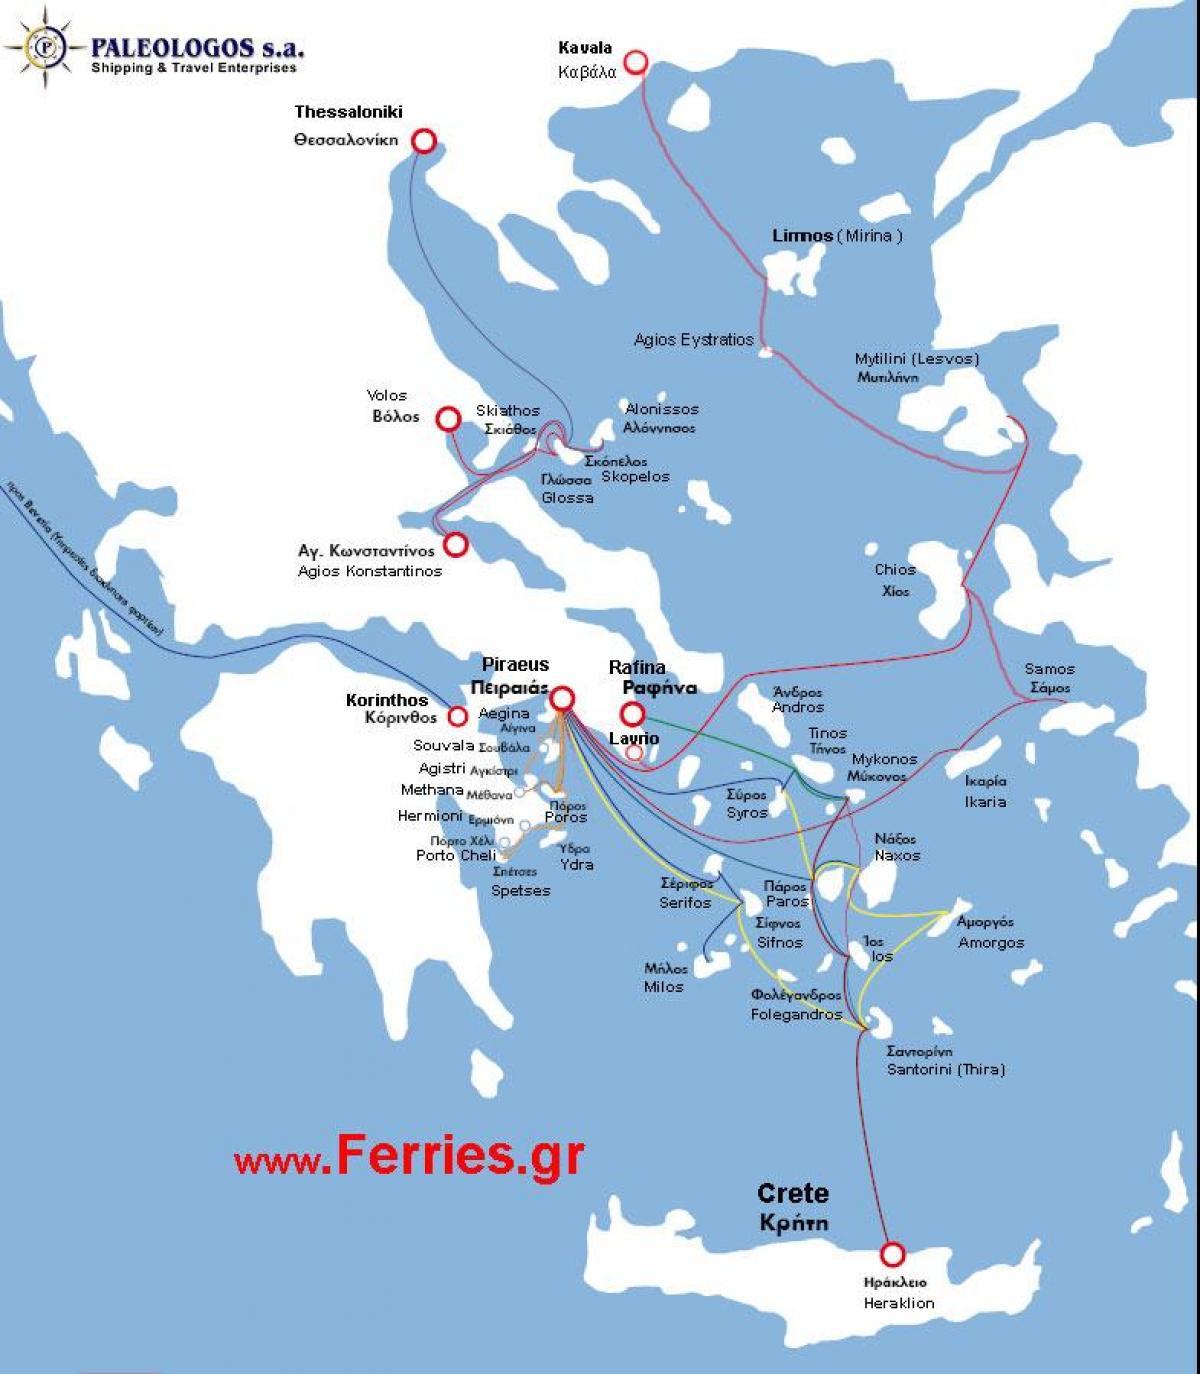 Griechische Fähre map - Griechenland Fähren Karte (Europa Süd - Europa)